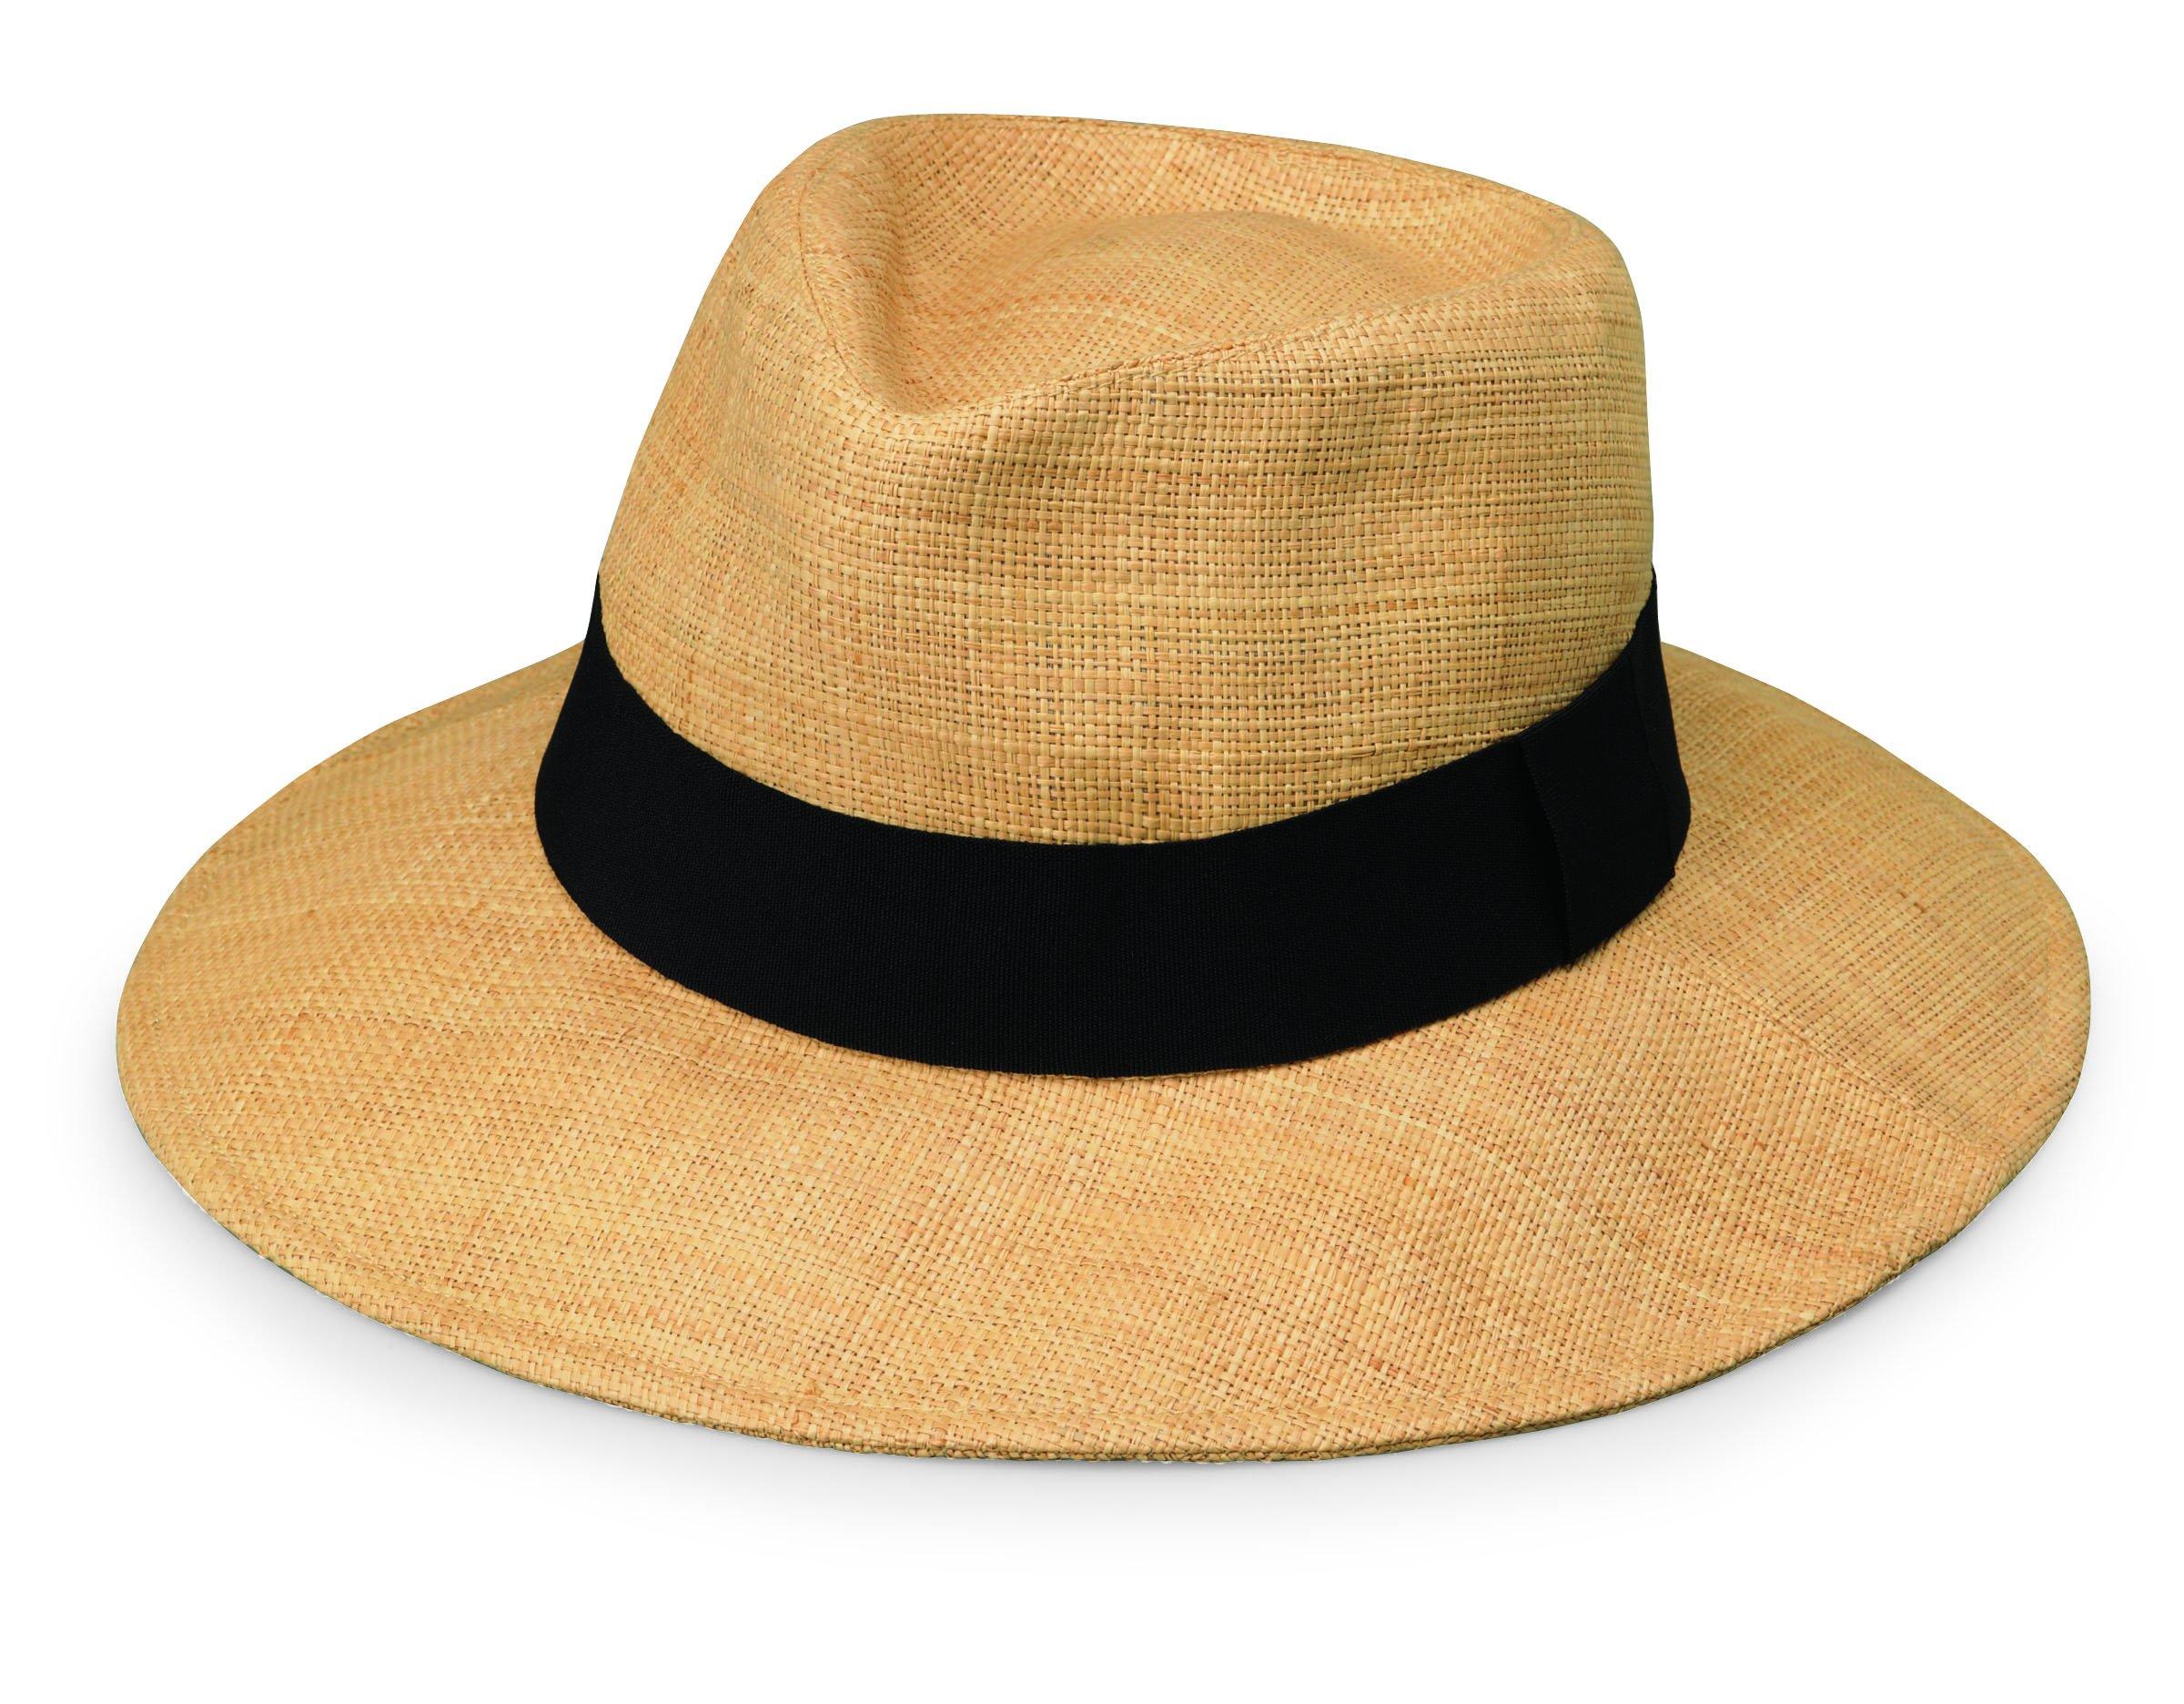 Wallaroo Hat Company Women's Morgan Fedora - Natural - UPF 50+, Modern Style